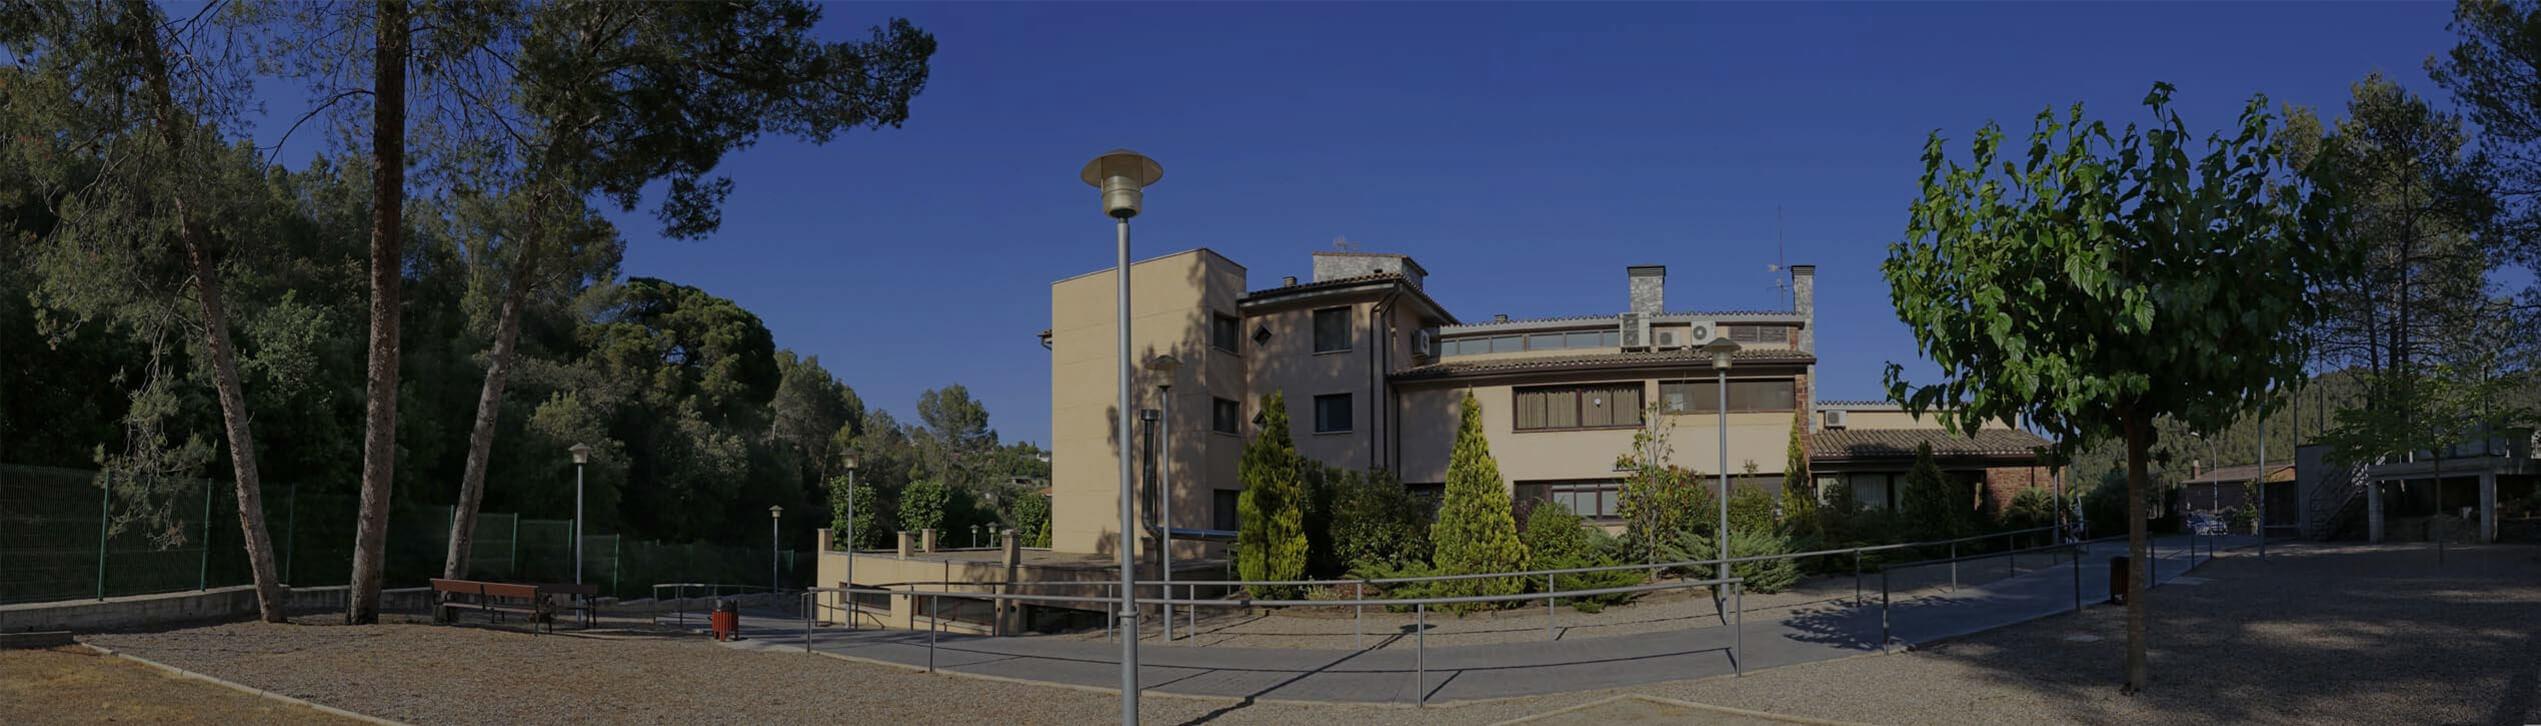 Palau de Can Sunyer | Llar d'avis